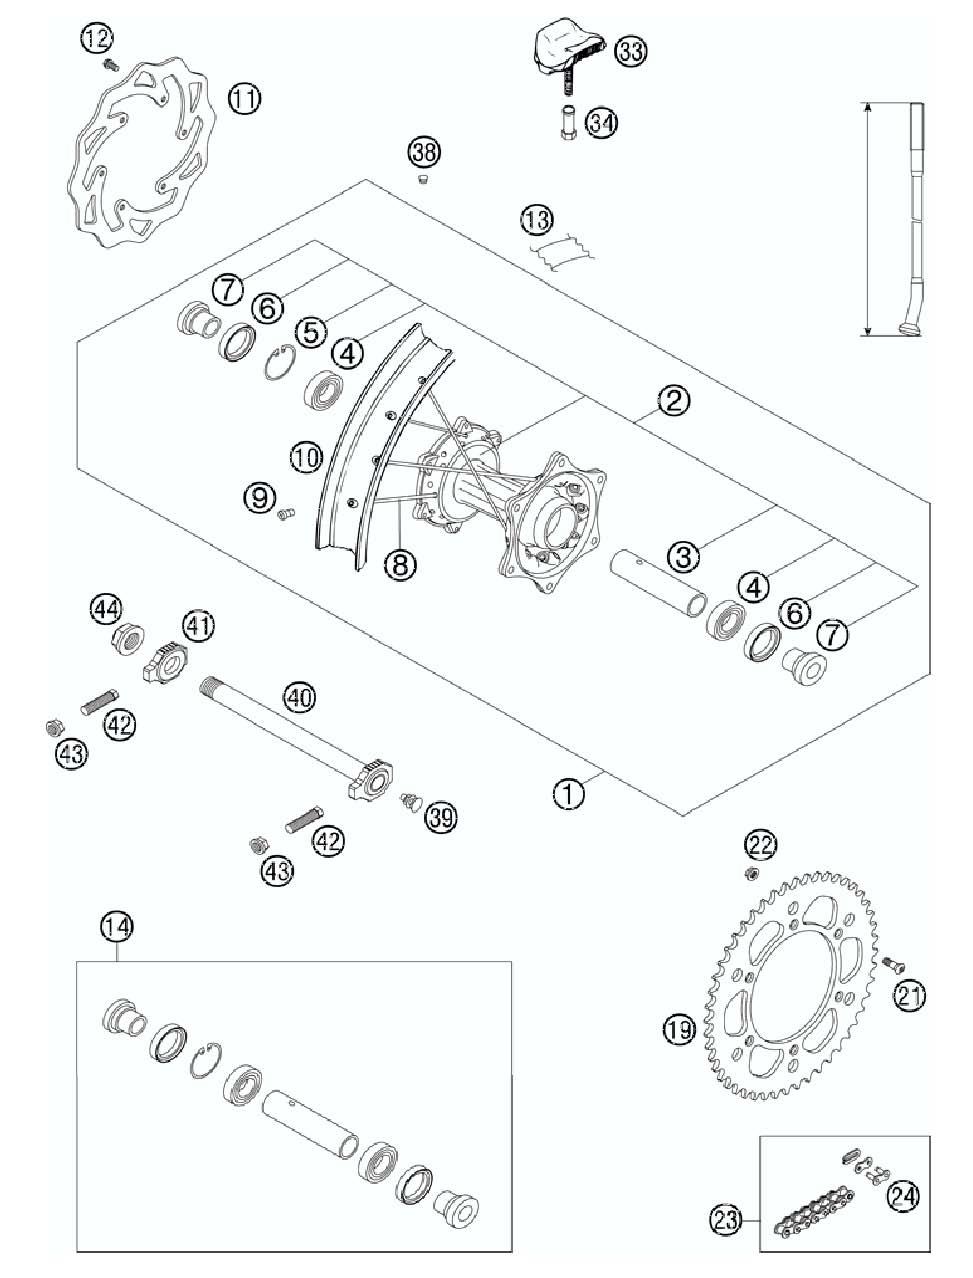 Quadrax atv seat wiring diagram seat wiring diagrams instructions chinese 110cc wiring diagram honda recon